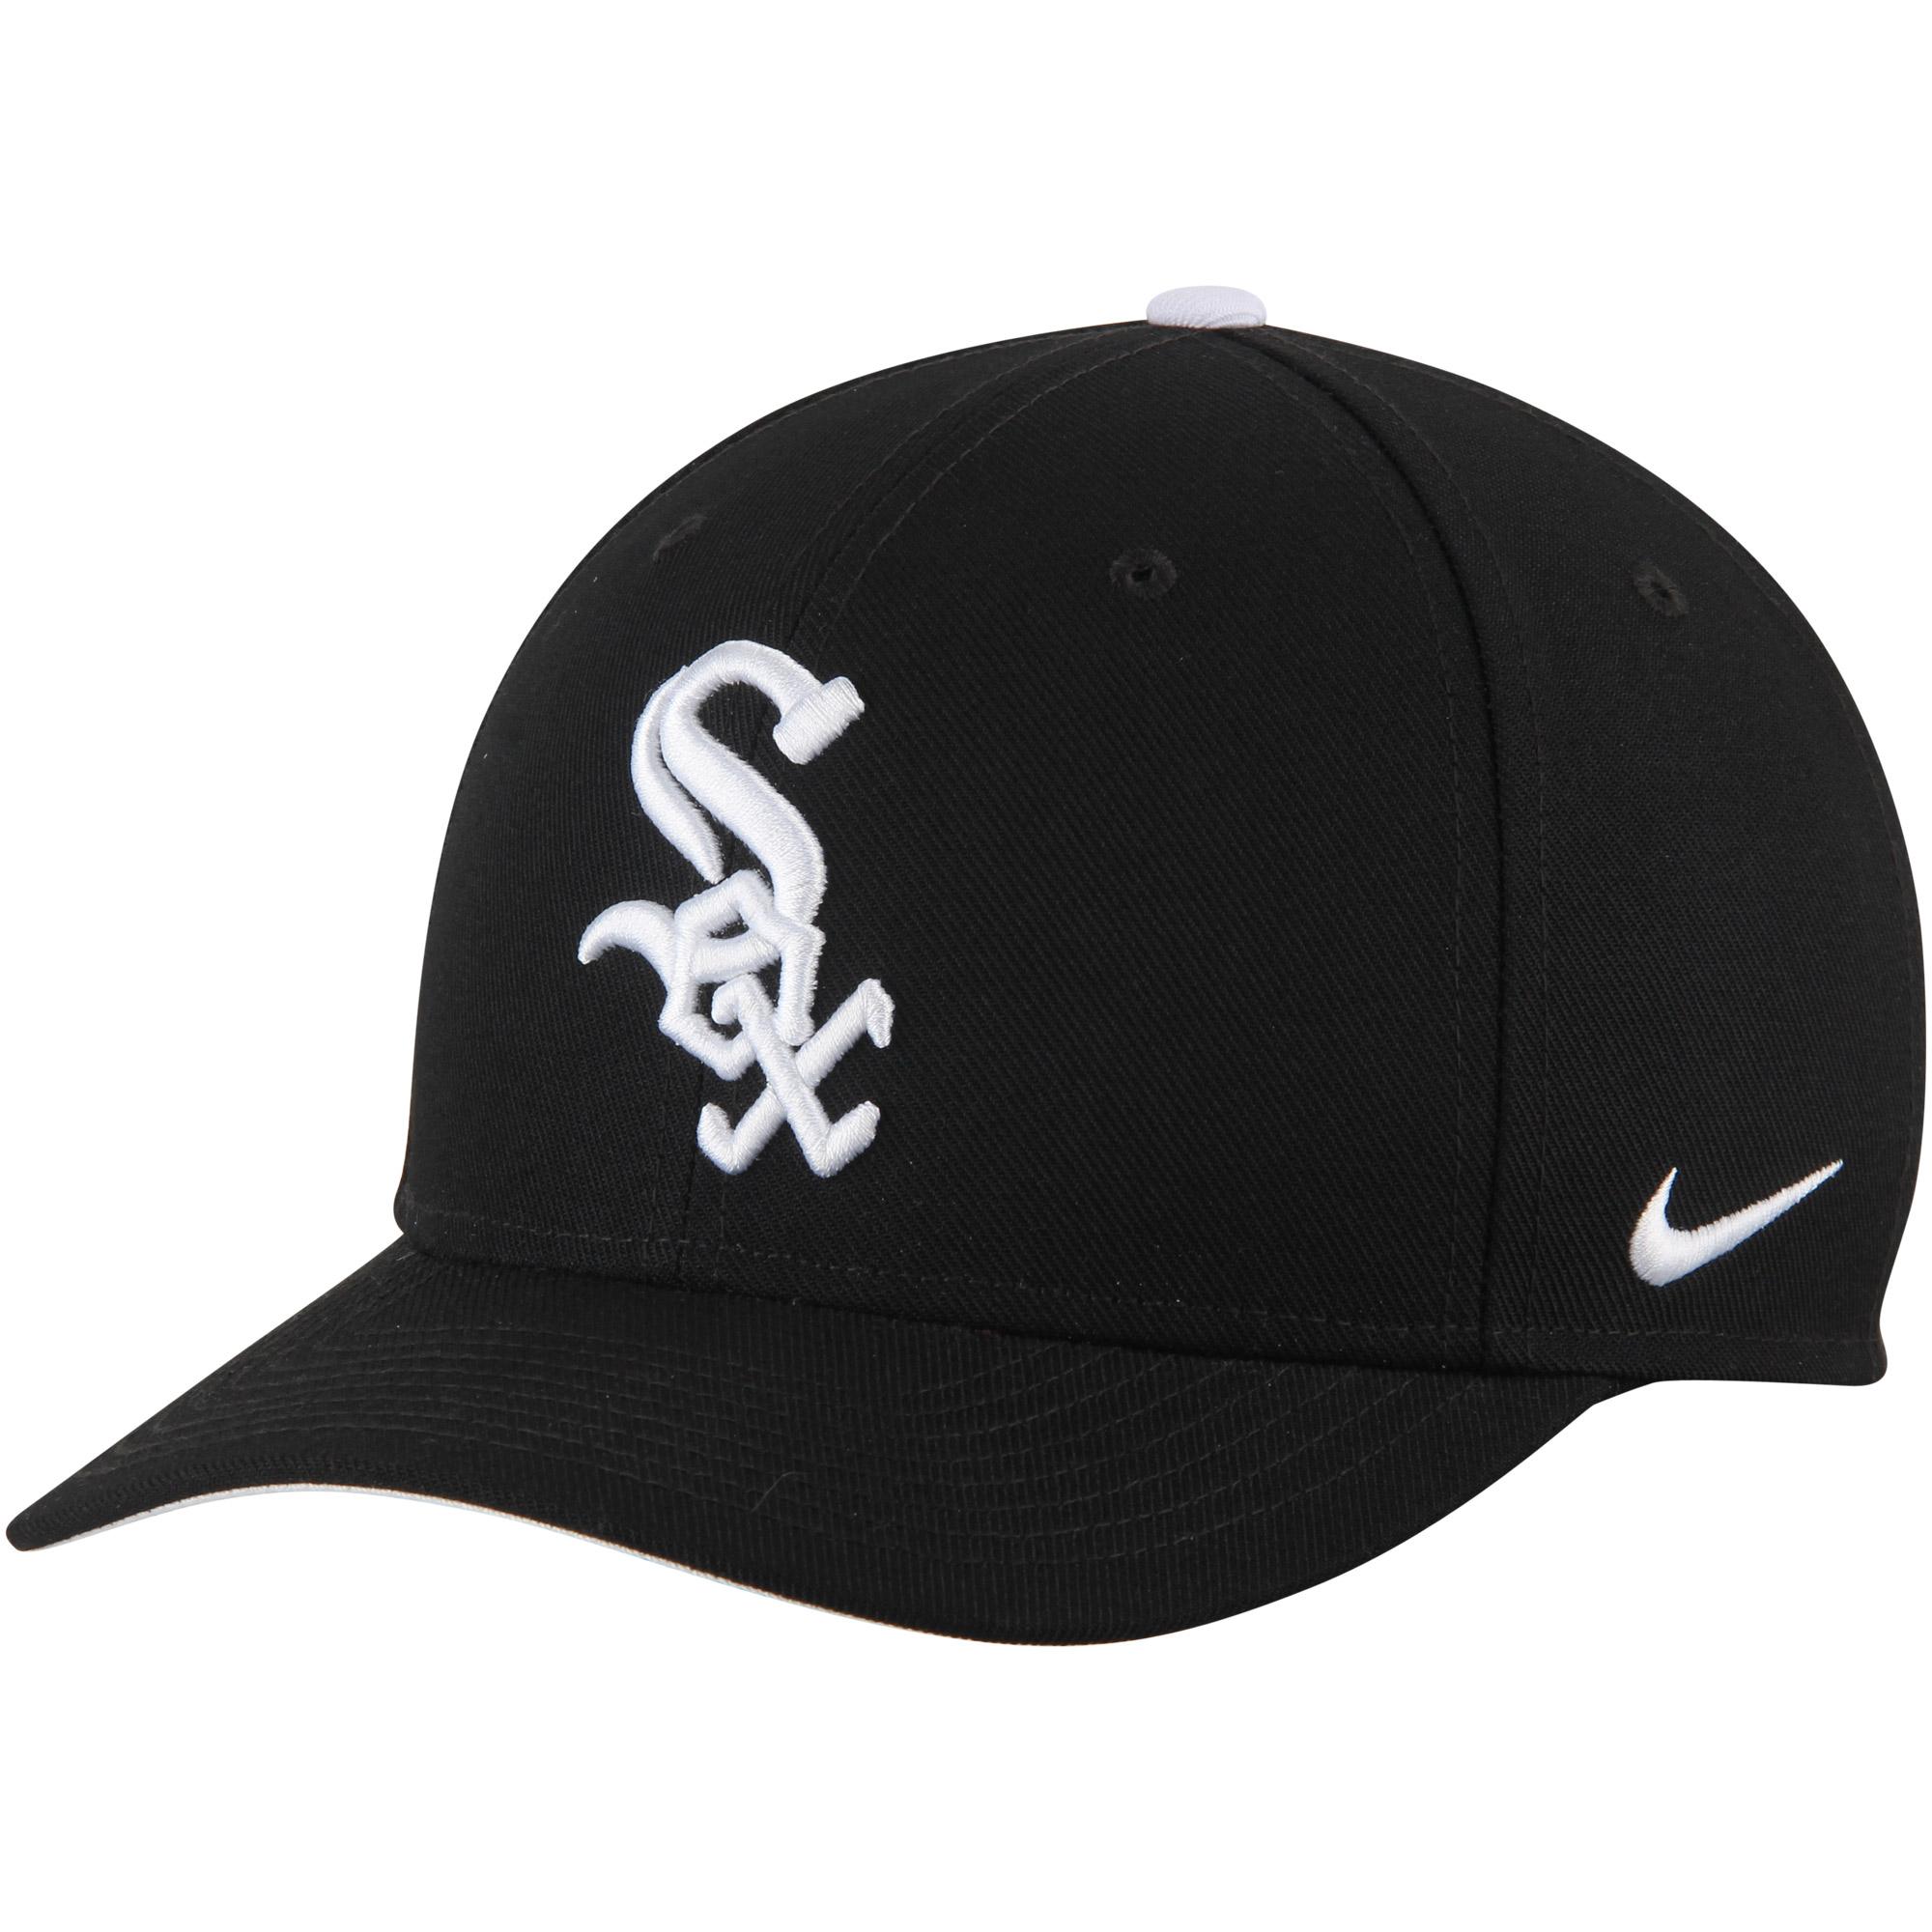 Chicago White Sox Nike Classic Adjustable Performance Hat - Black - OSFA